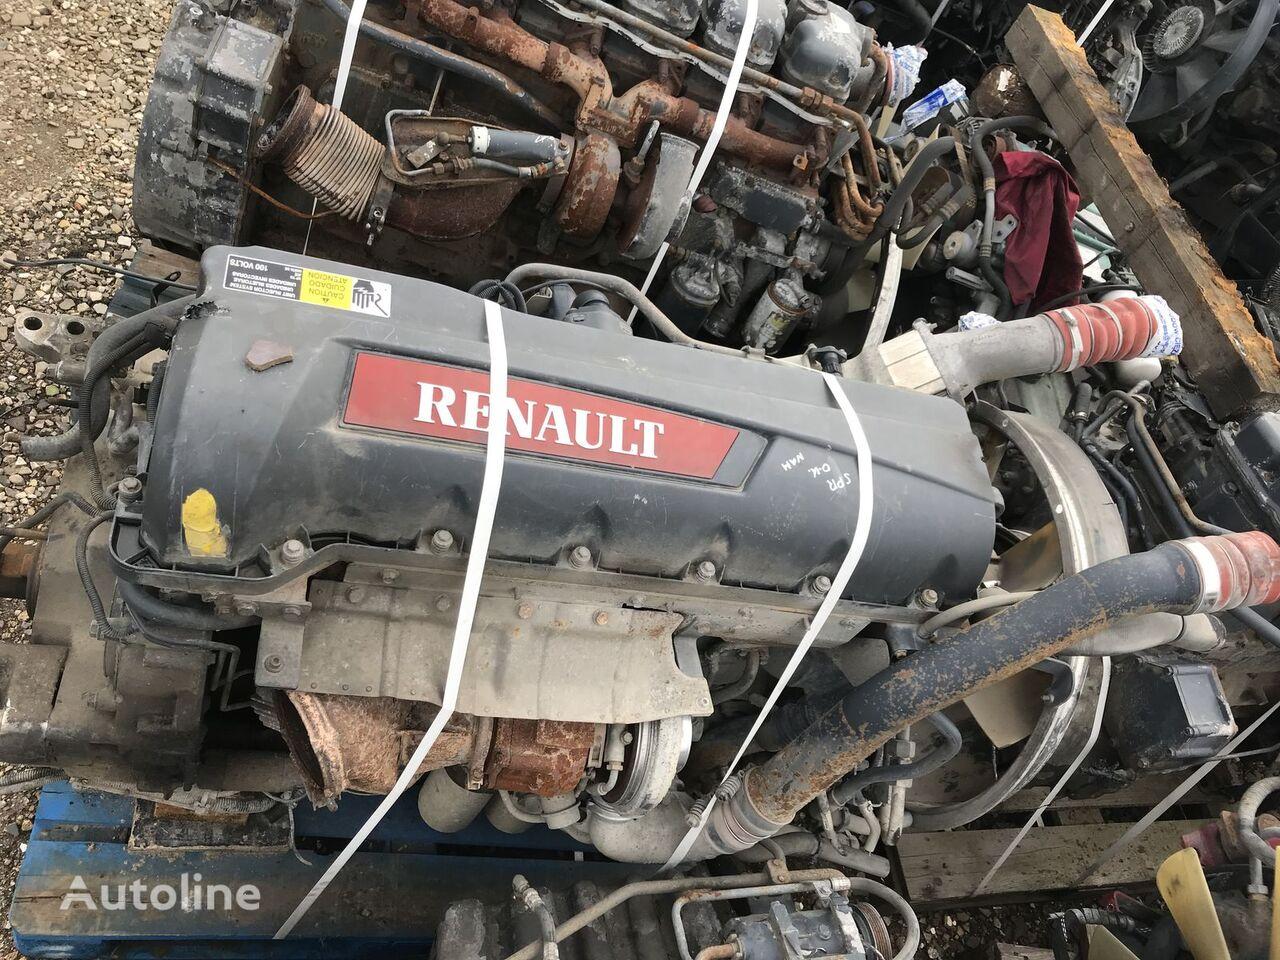 двигатель RENAULT DXi11 450 EC06 для тягача RENAULT PREMIUM